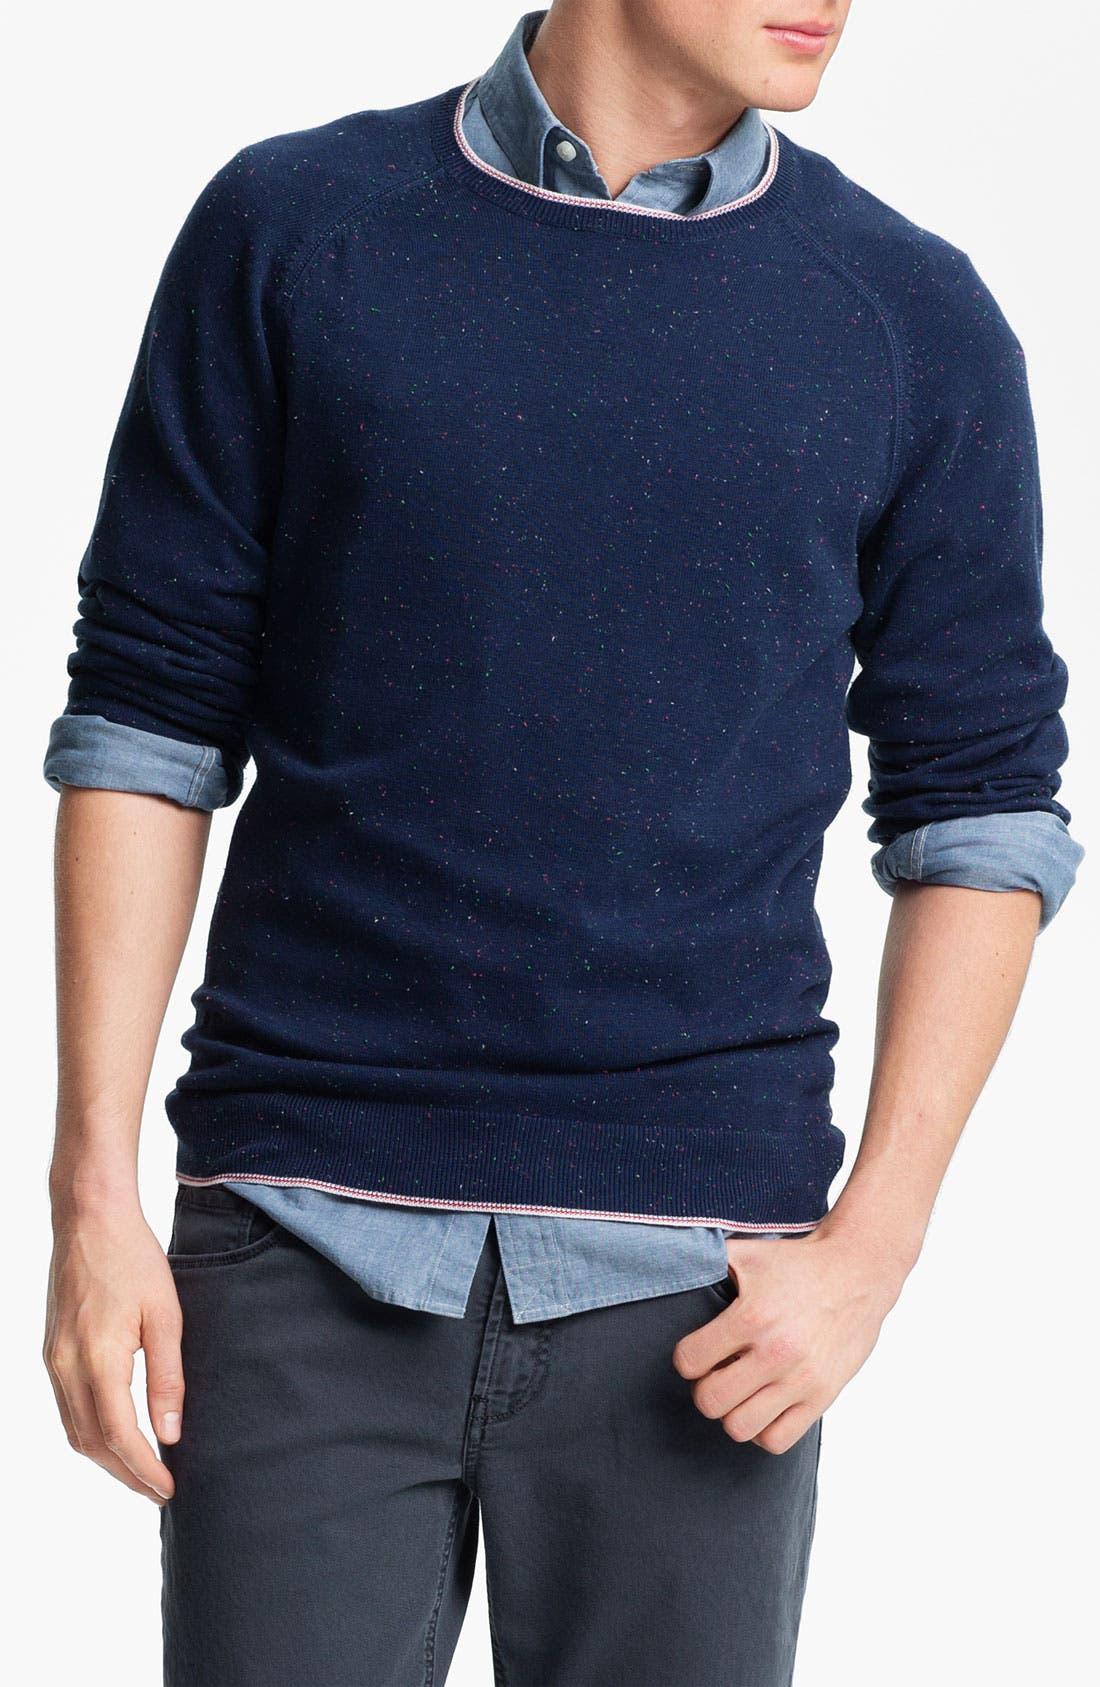 Main Image - Agave 'Abeam' Crewneck Sweater